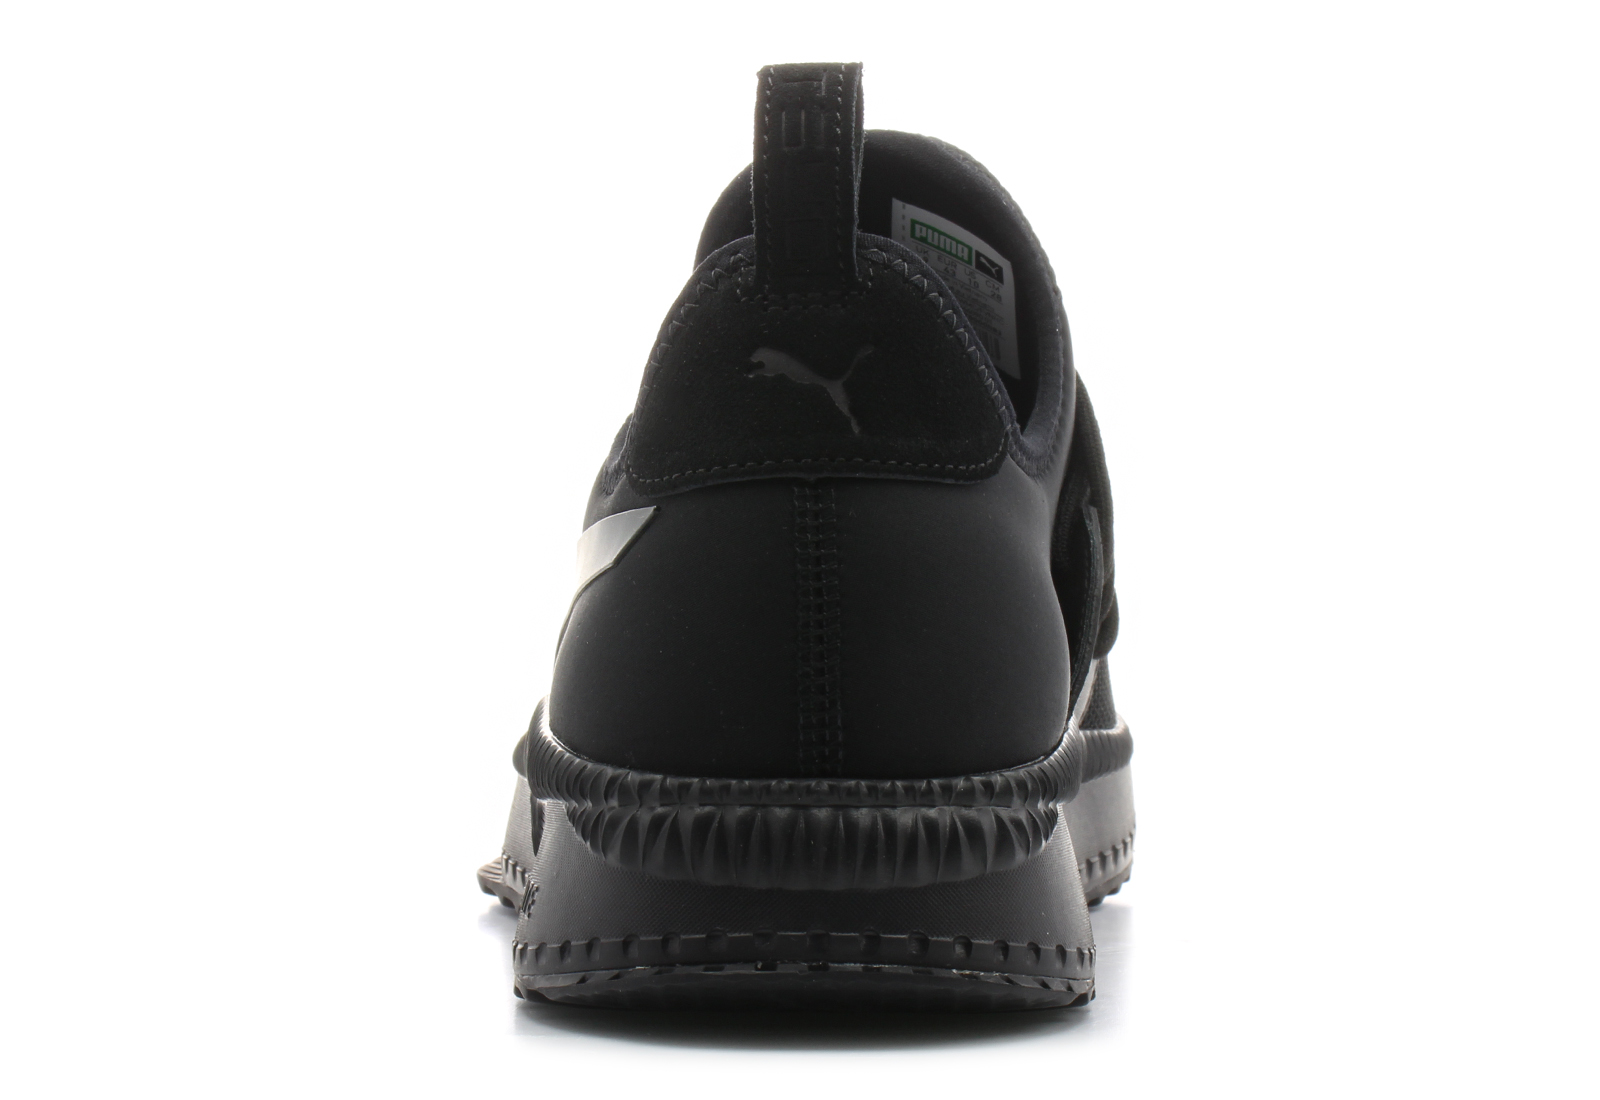 Puma Cipő - Tsugi Apex - 36609001-blk - Office Shoes Magyarország f3e2115245